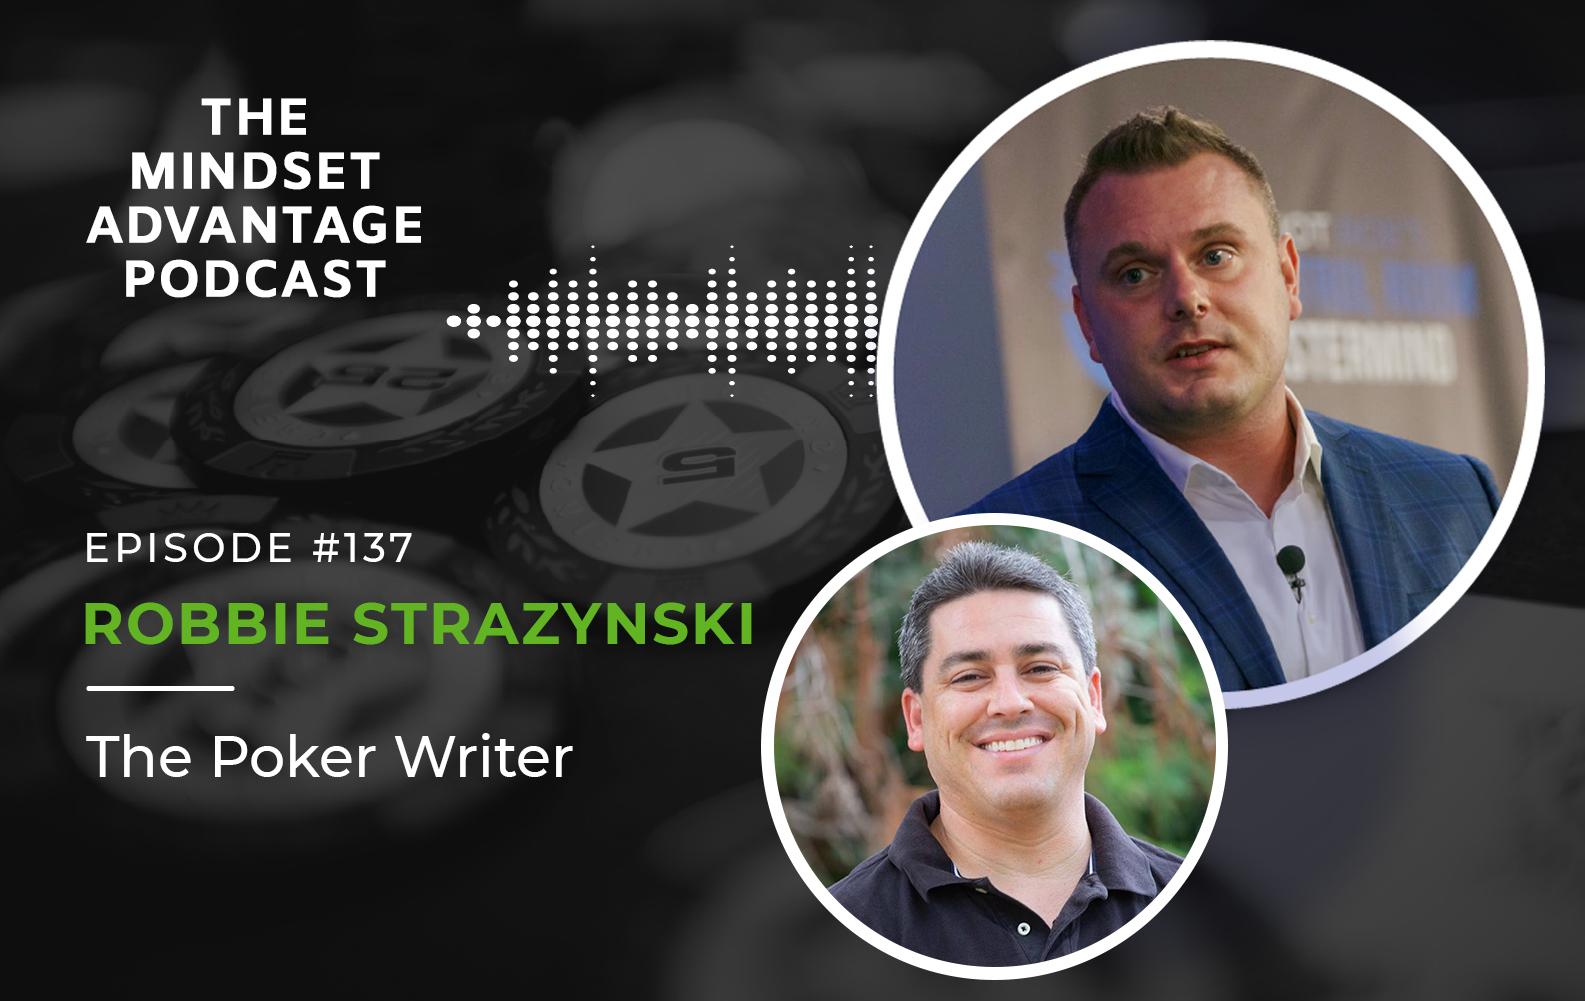 Episode 137 - Robbie Strazynski